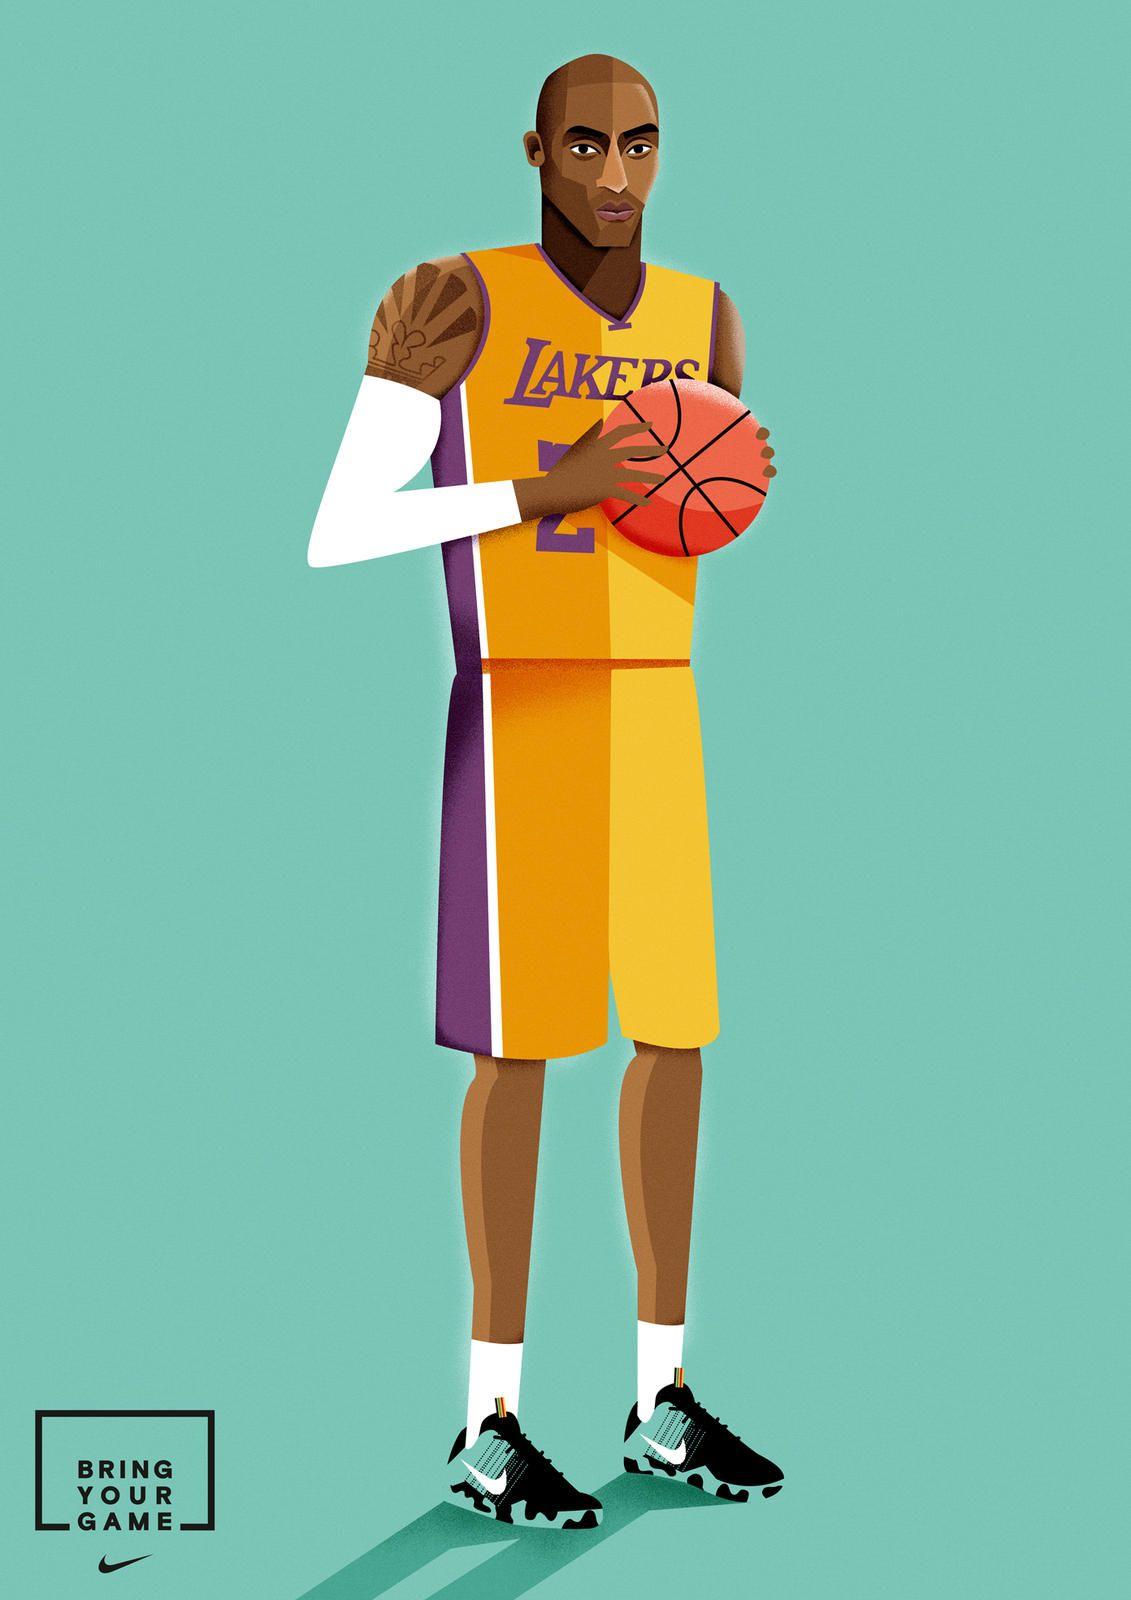 Nike Basketball Celebrates the Game's Stars